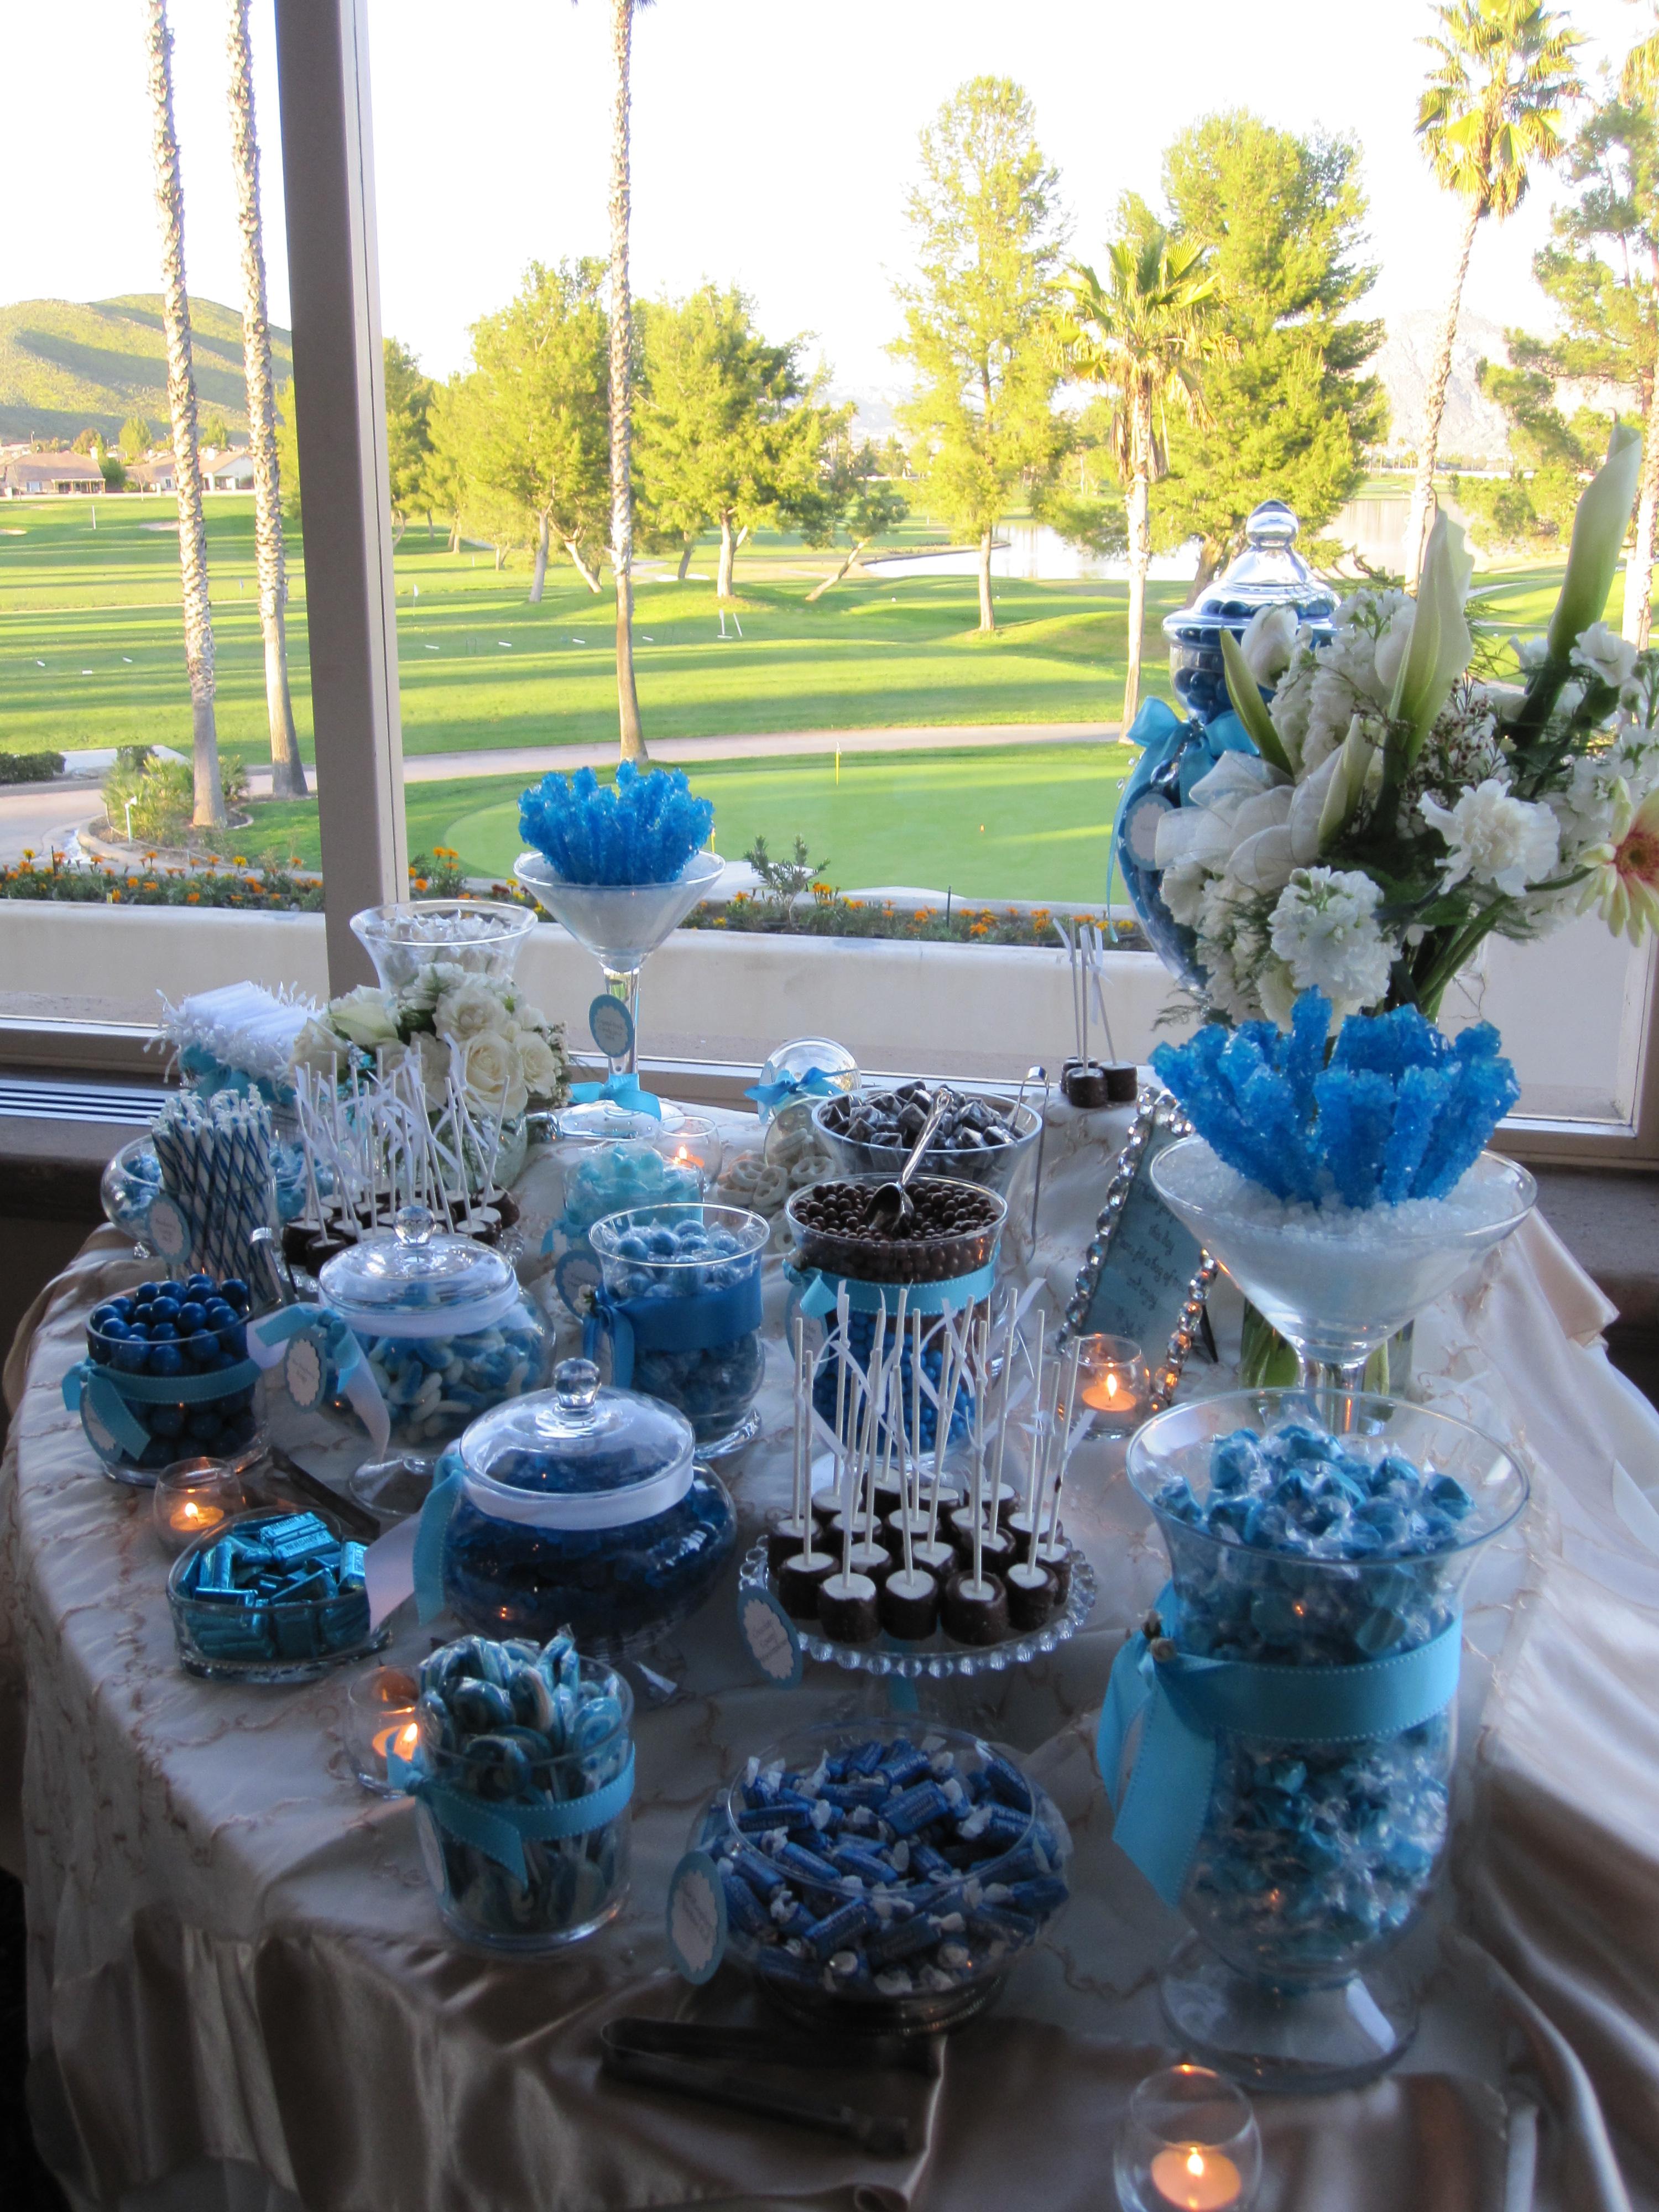 Real wedding decorations delahunty ccwed